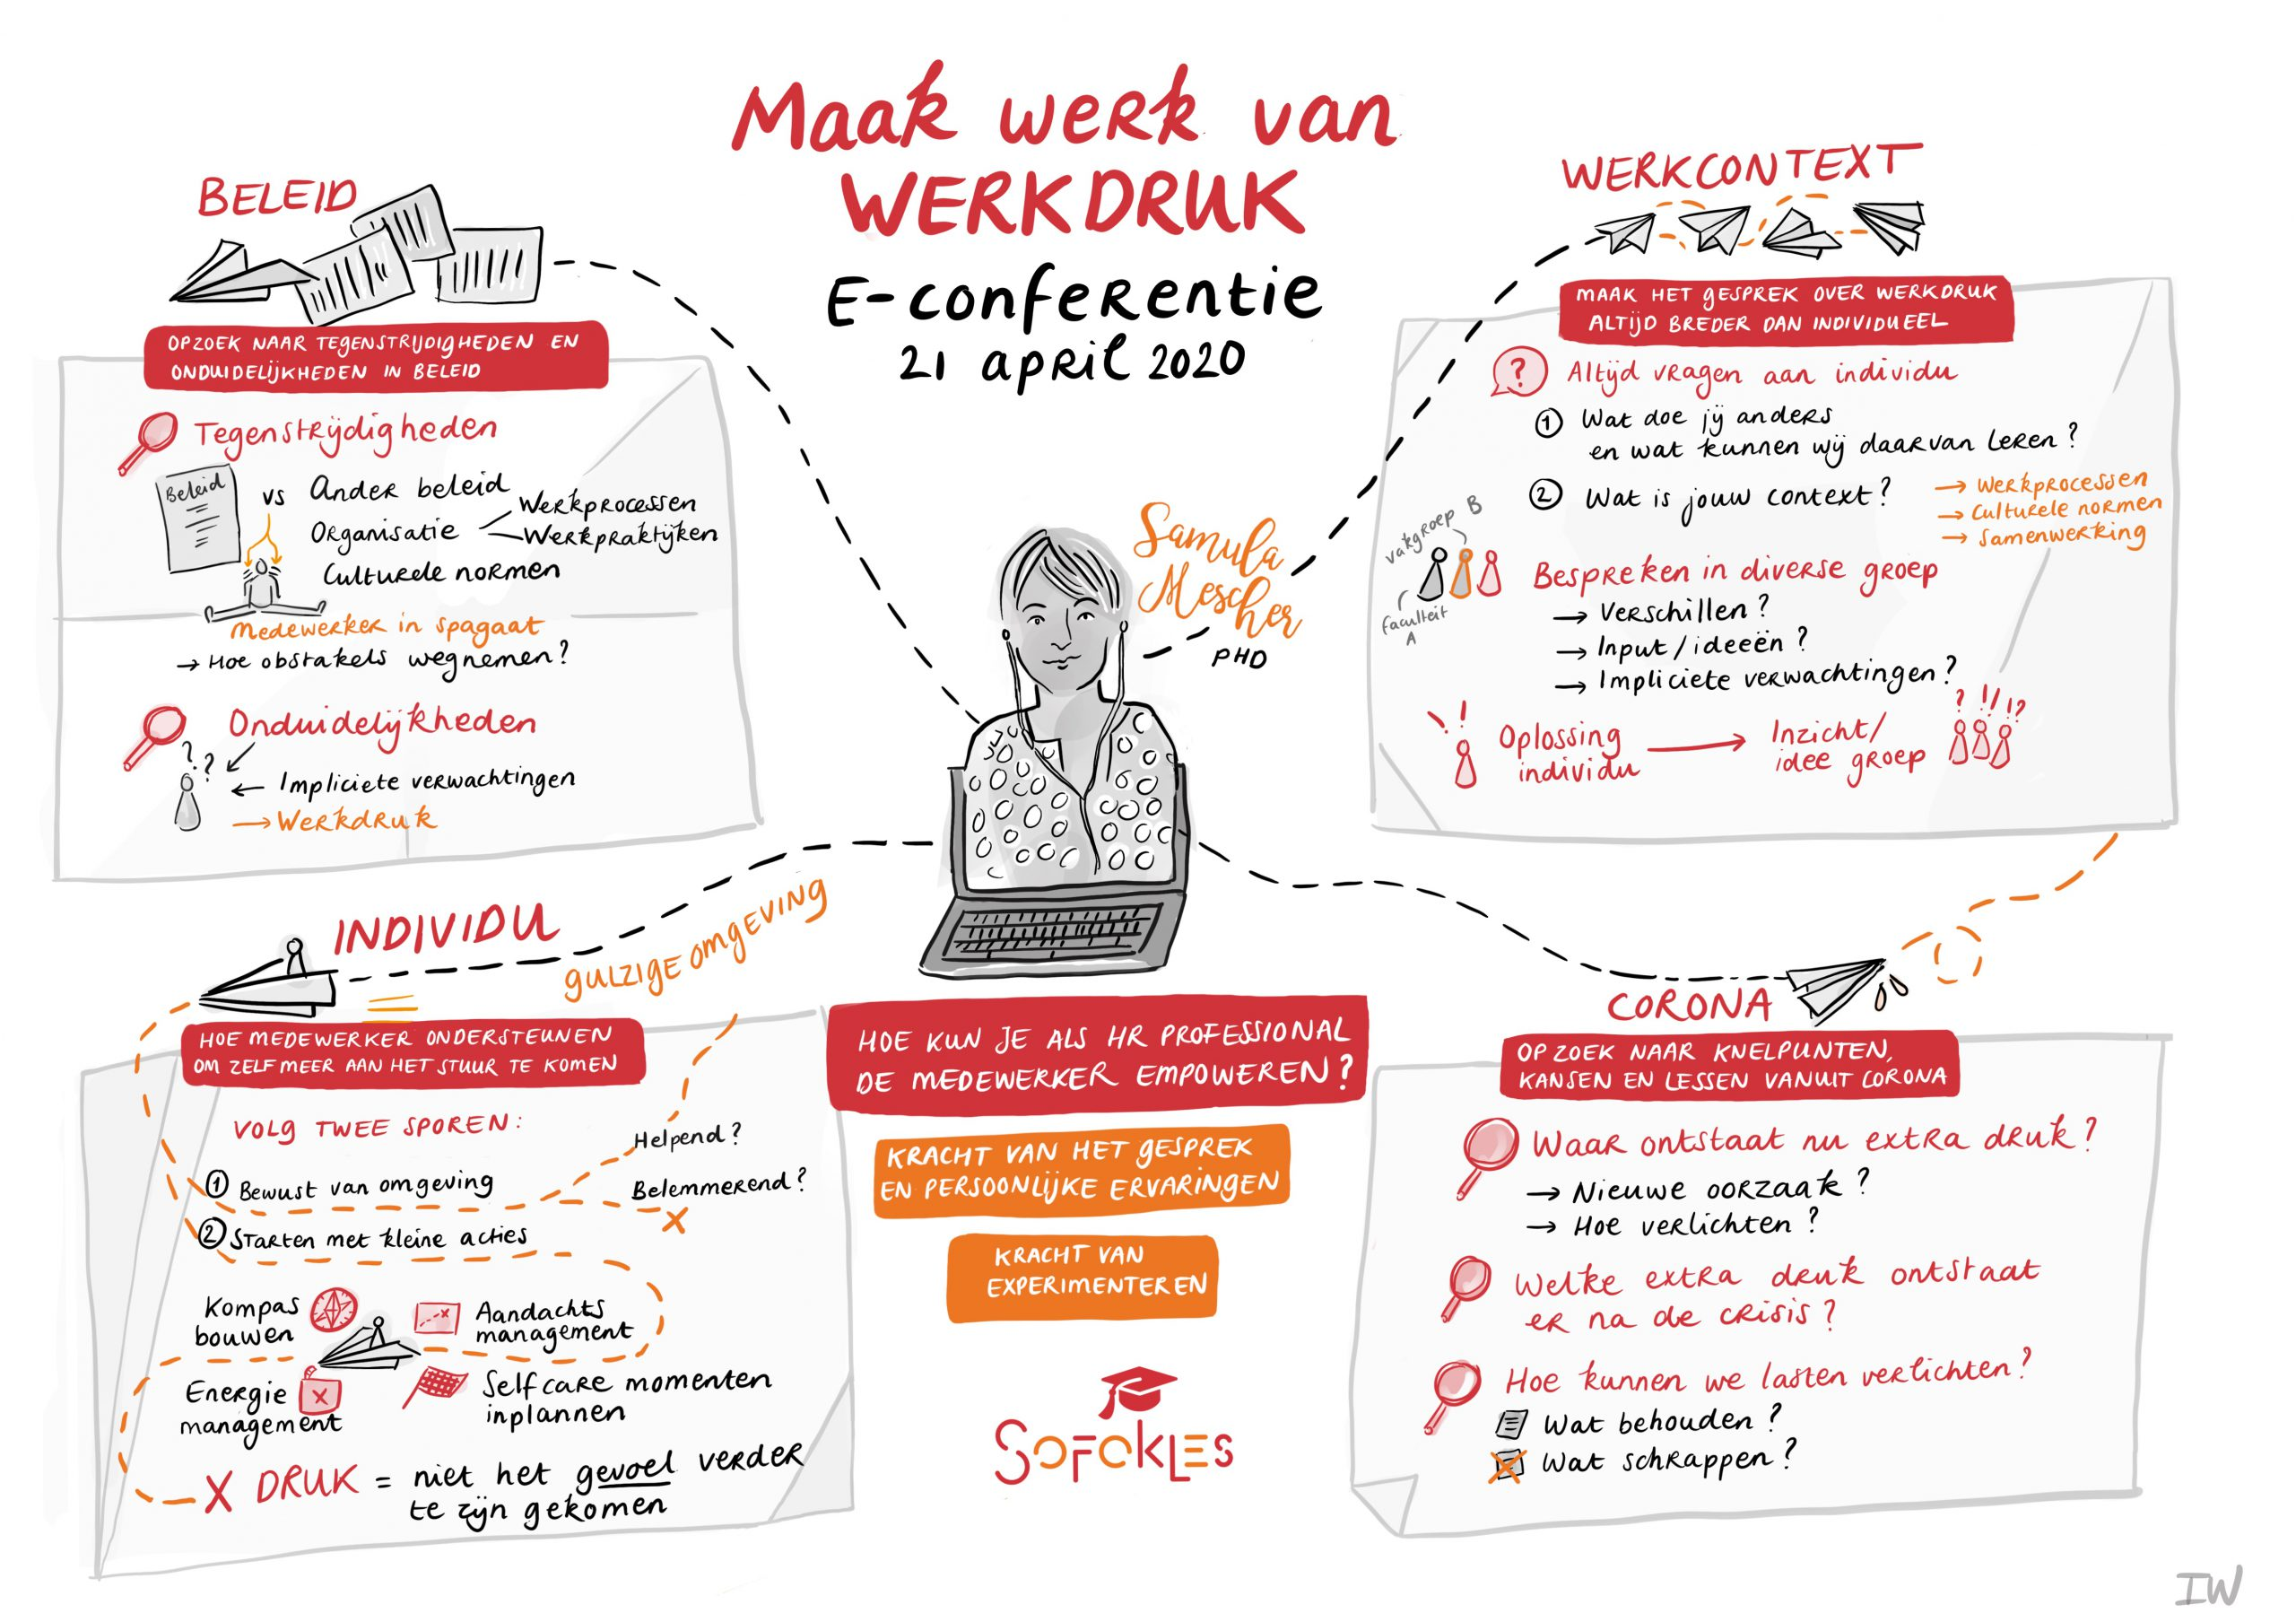 Visueel verslag van e-conferentie Maak werk van werkdruk